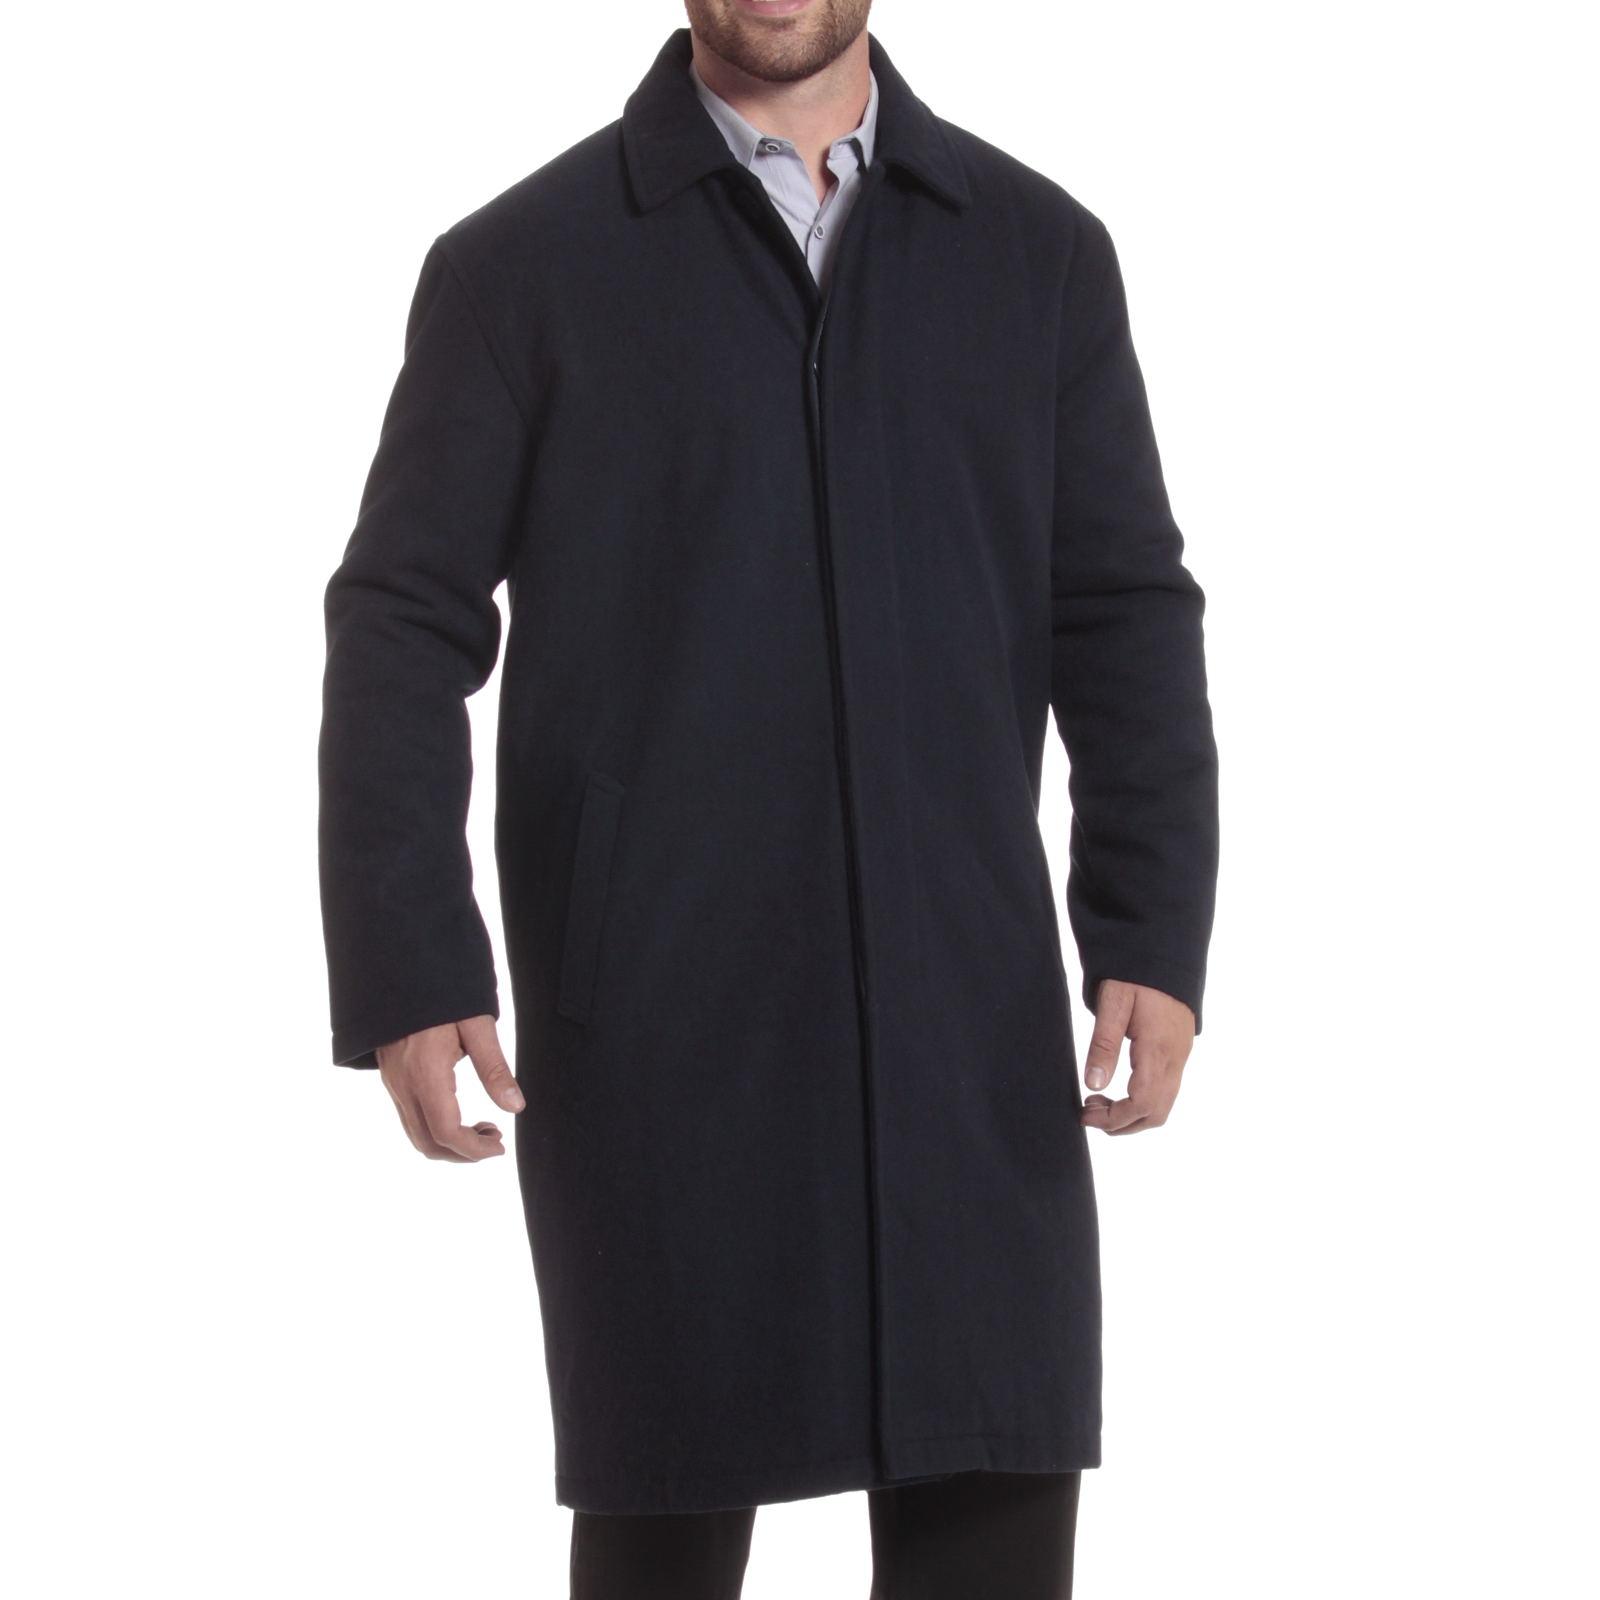 Knee length overcoat